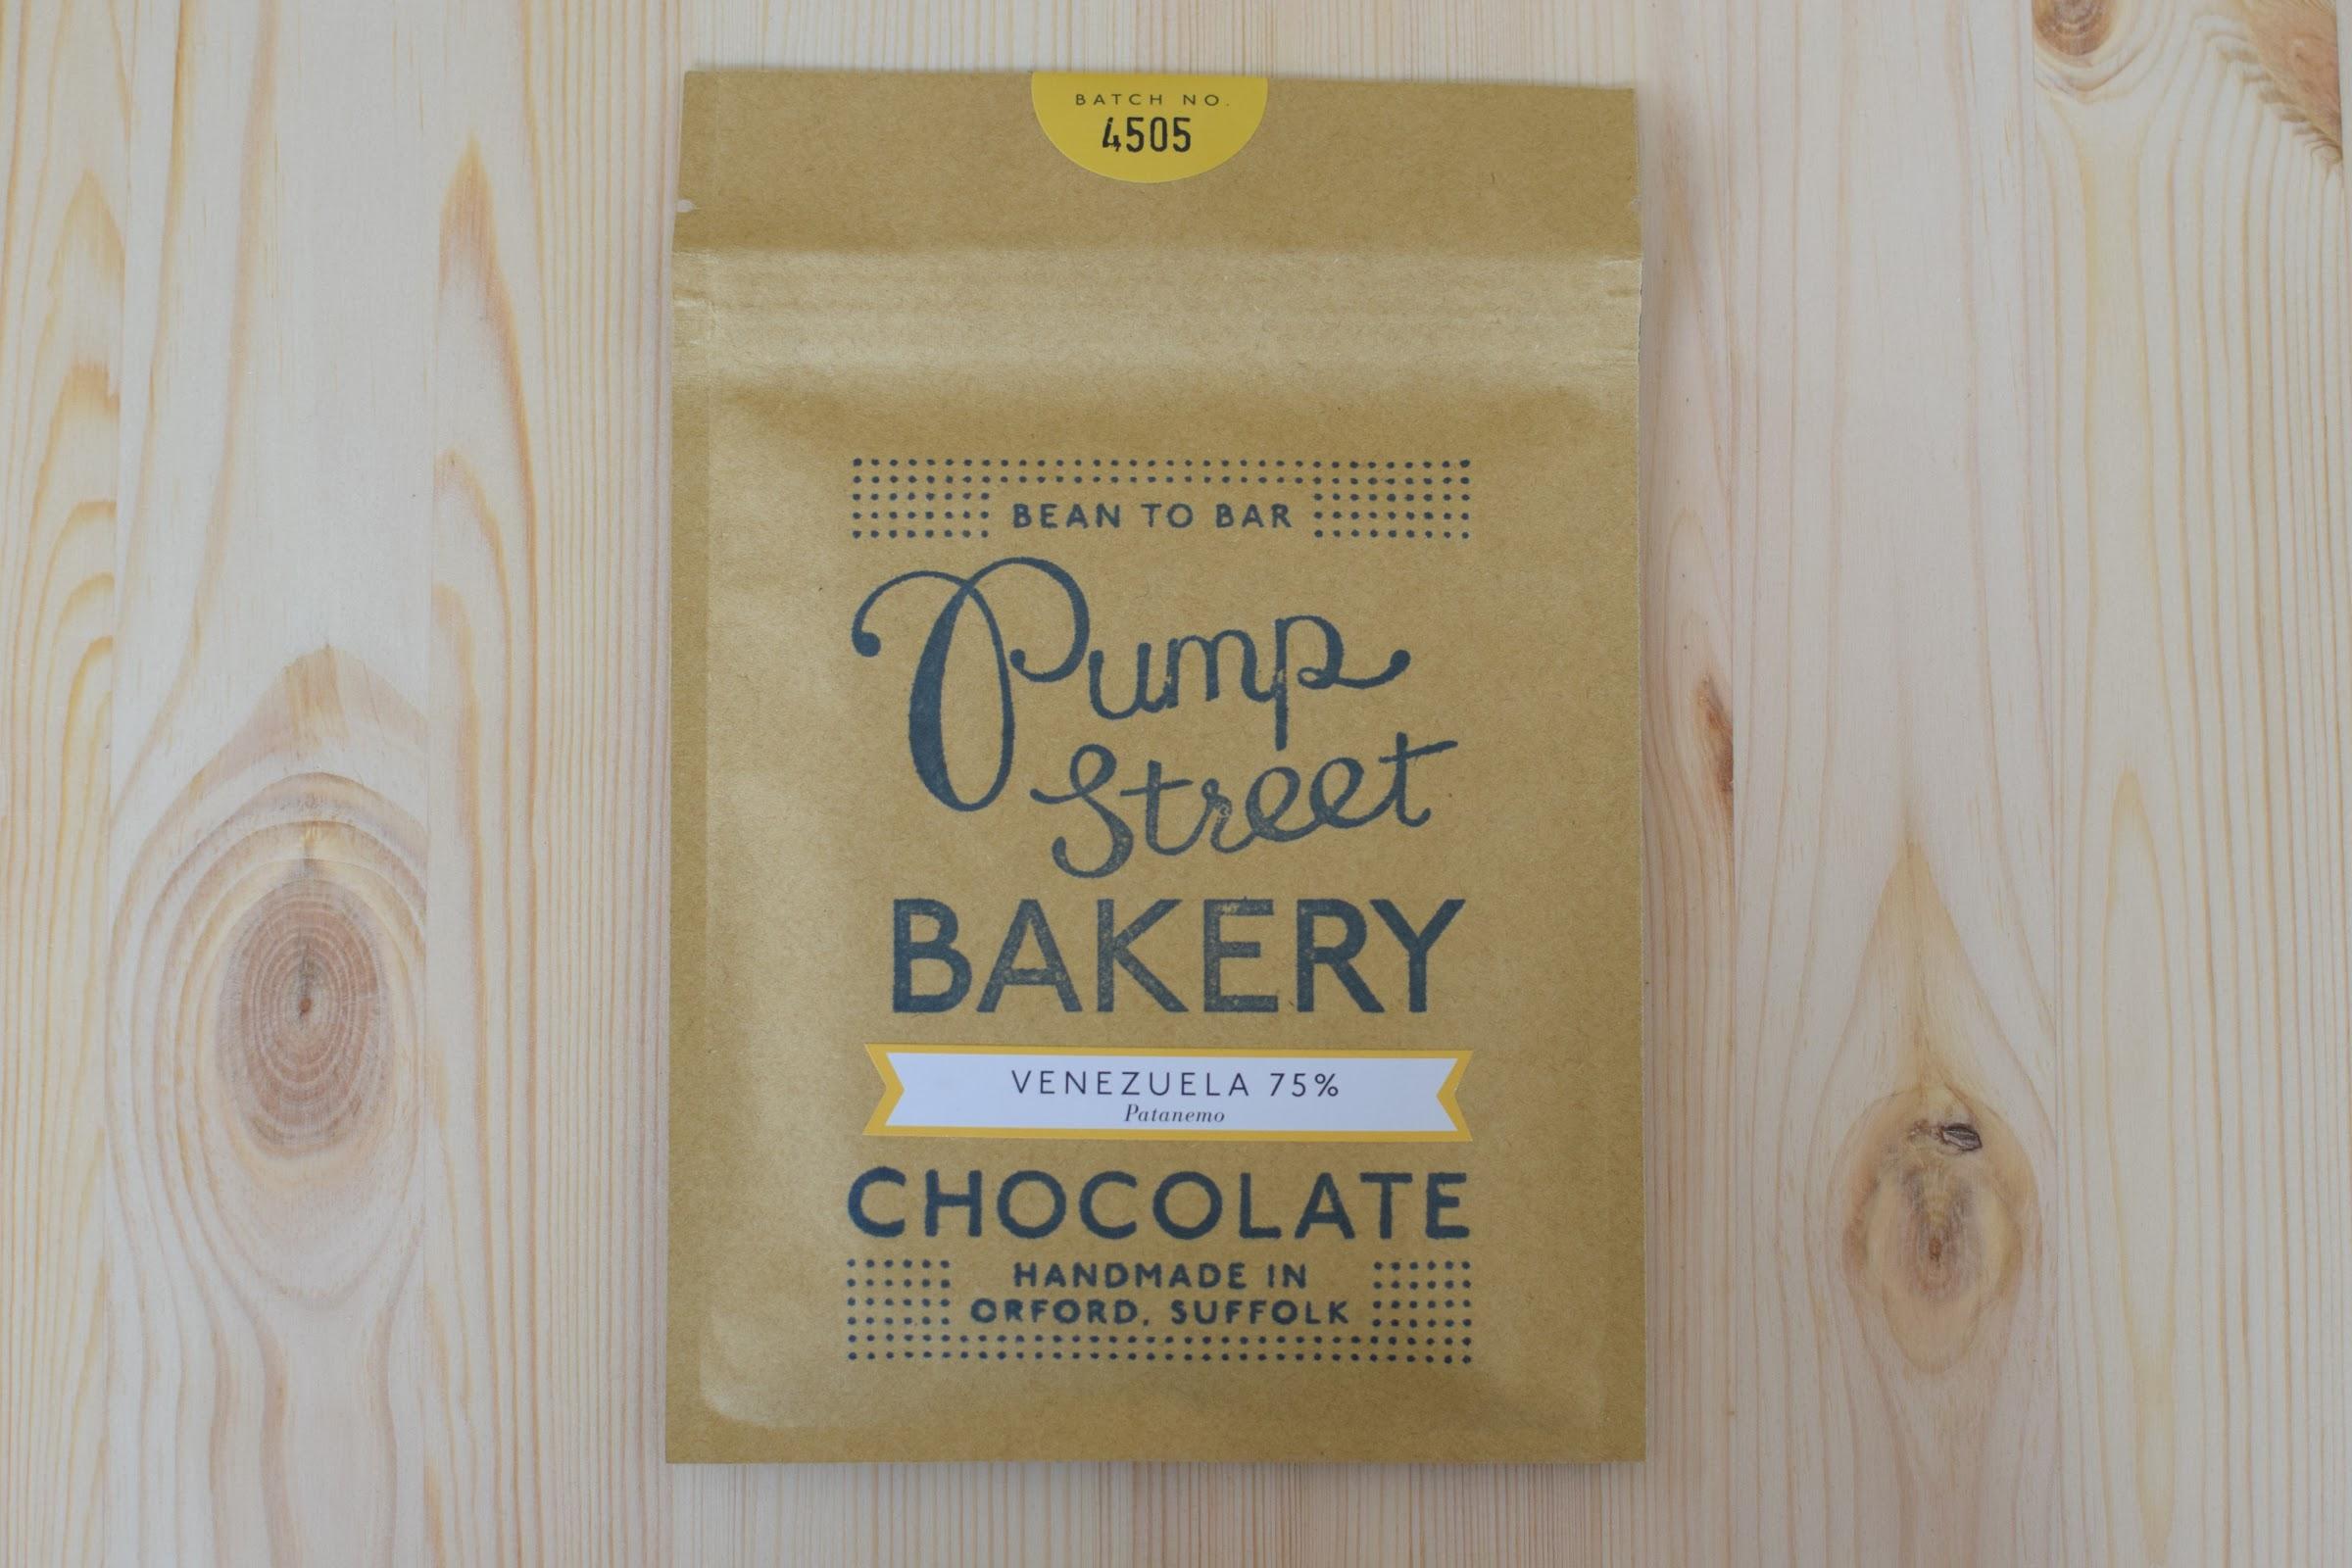 Pump Street Bakery Venezuela Patanemo 75 875100